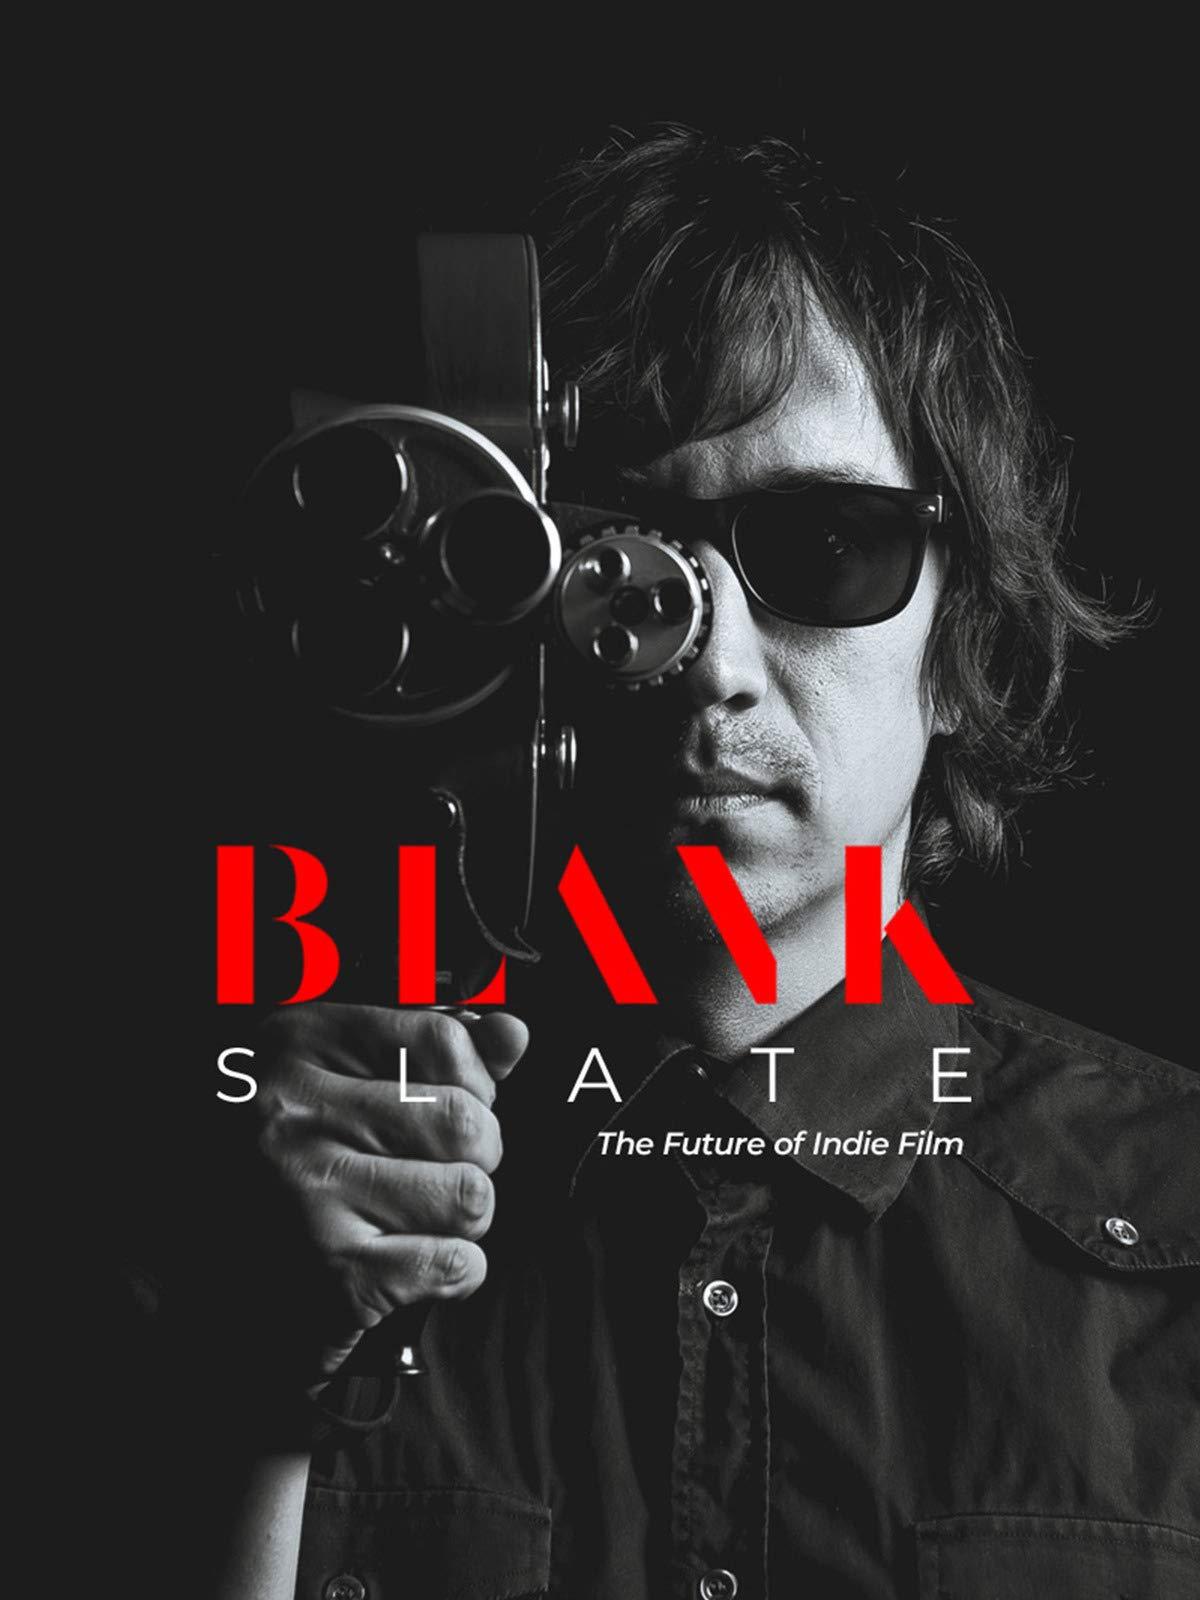 Blank Slate: The Future of Indie Film